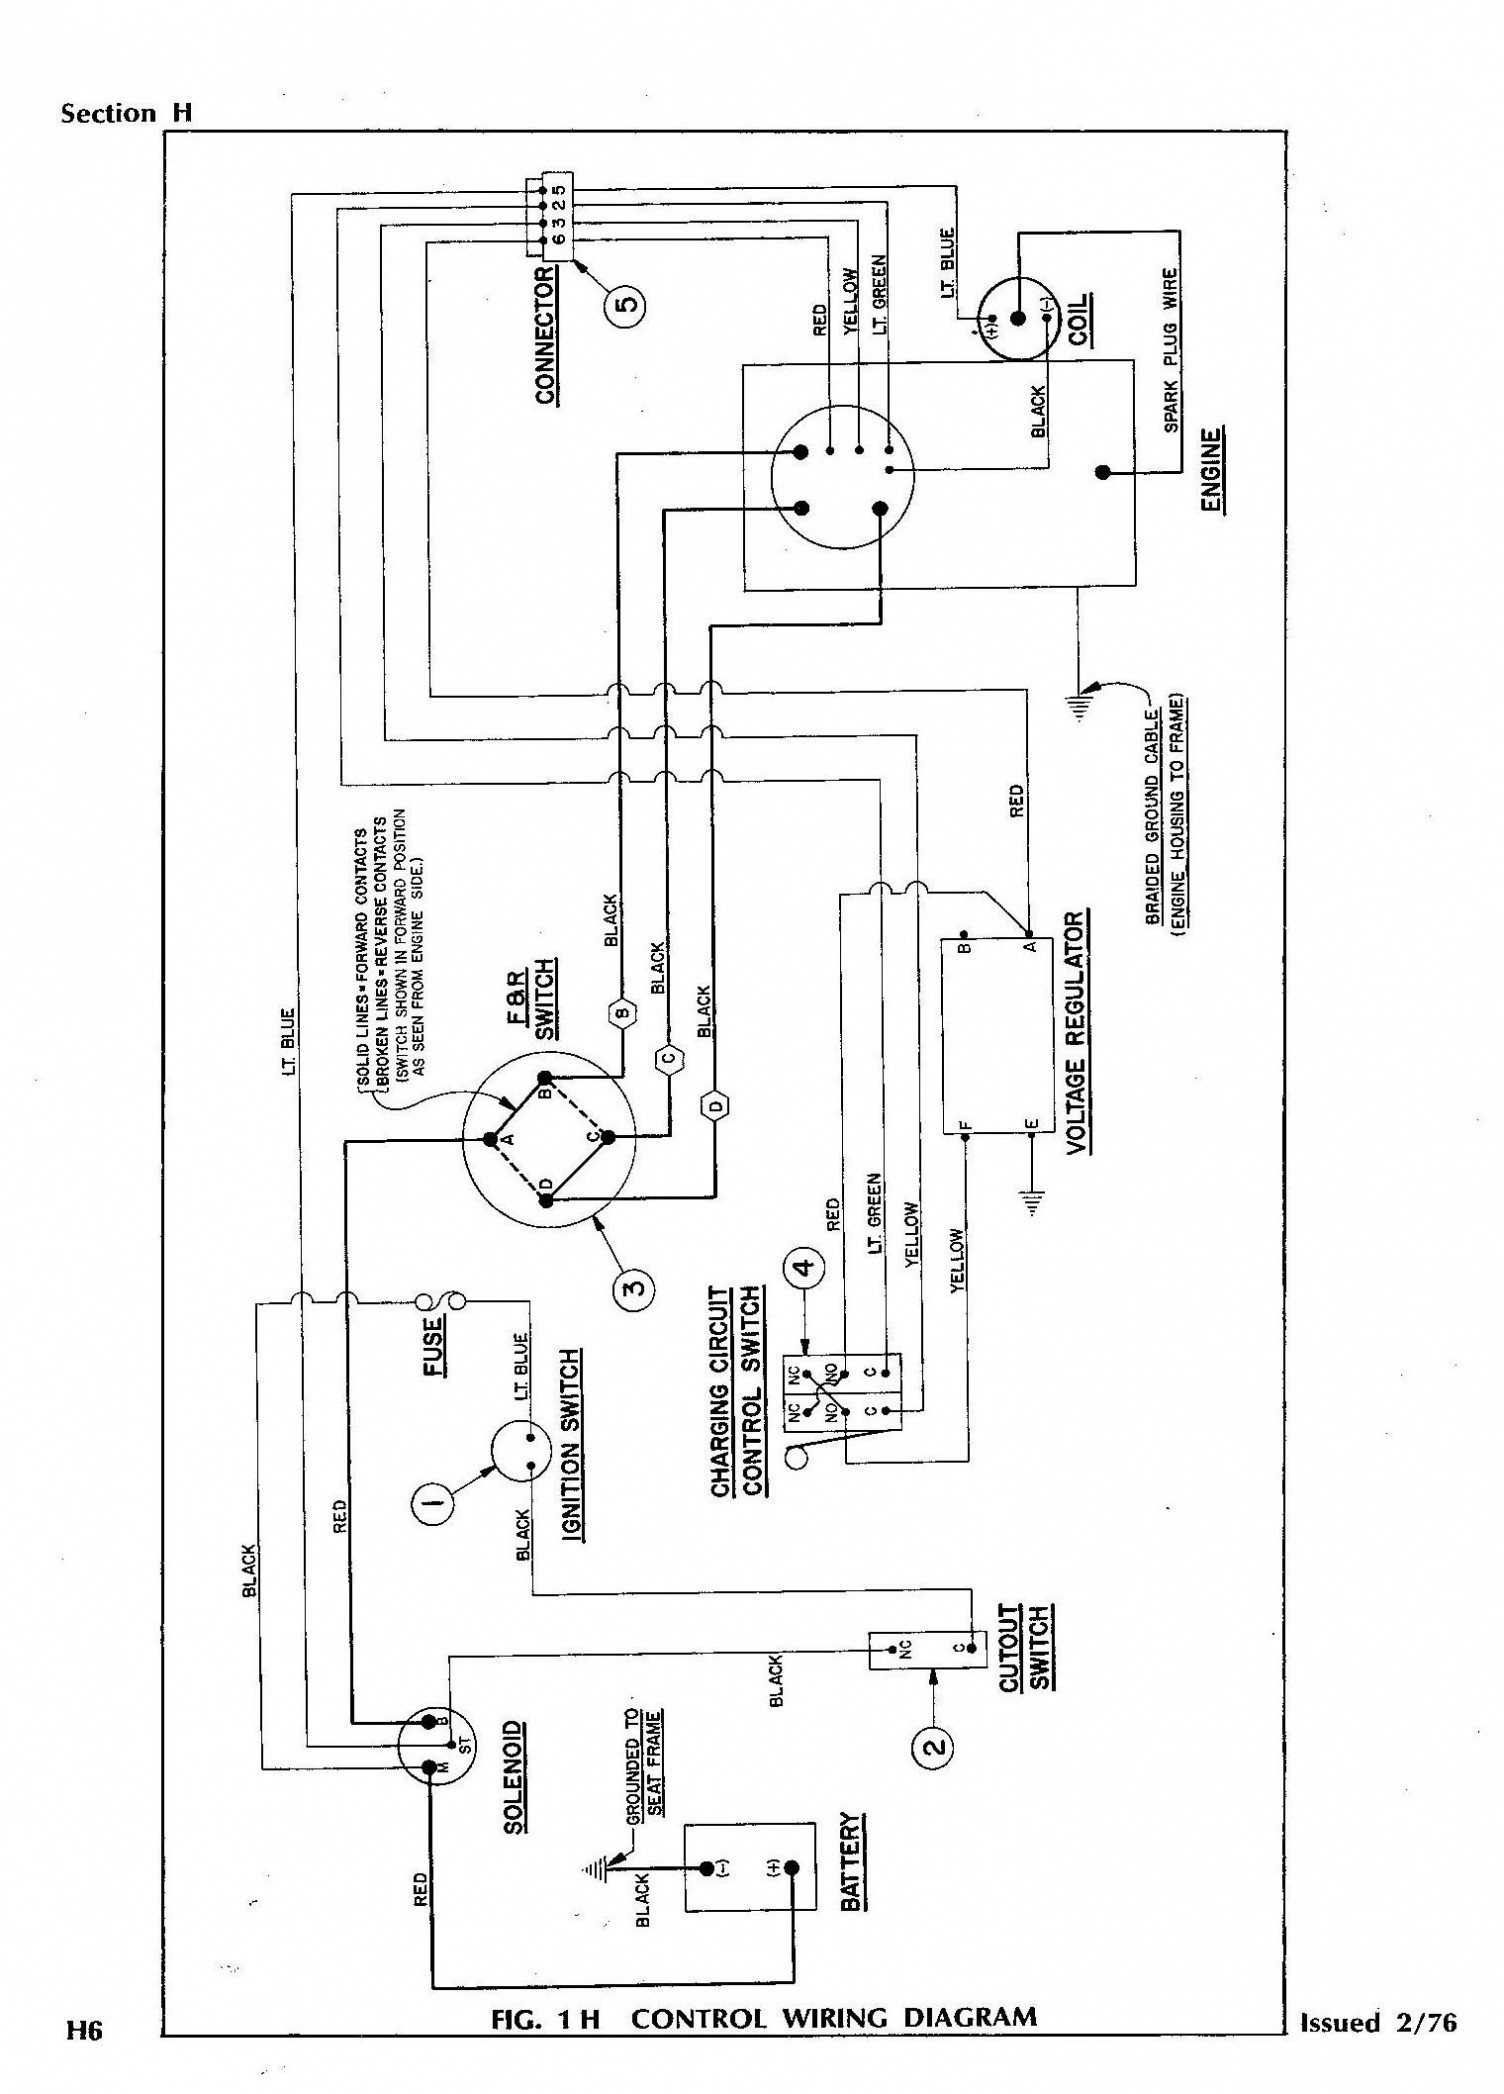 Wiring Diagram for A 1988 Club Car Ds 6087] 36 Volt Club Car Wiring Diagram Schematic Of Wiring Diagram for A 1988 Club Car